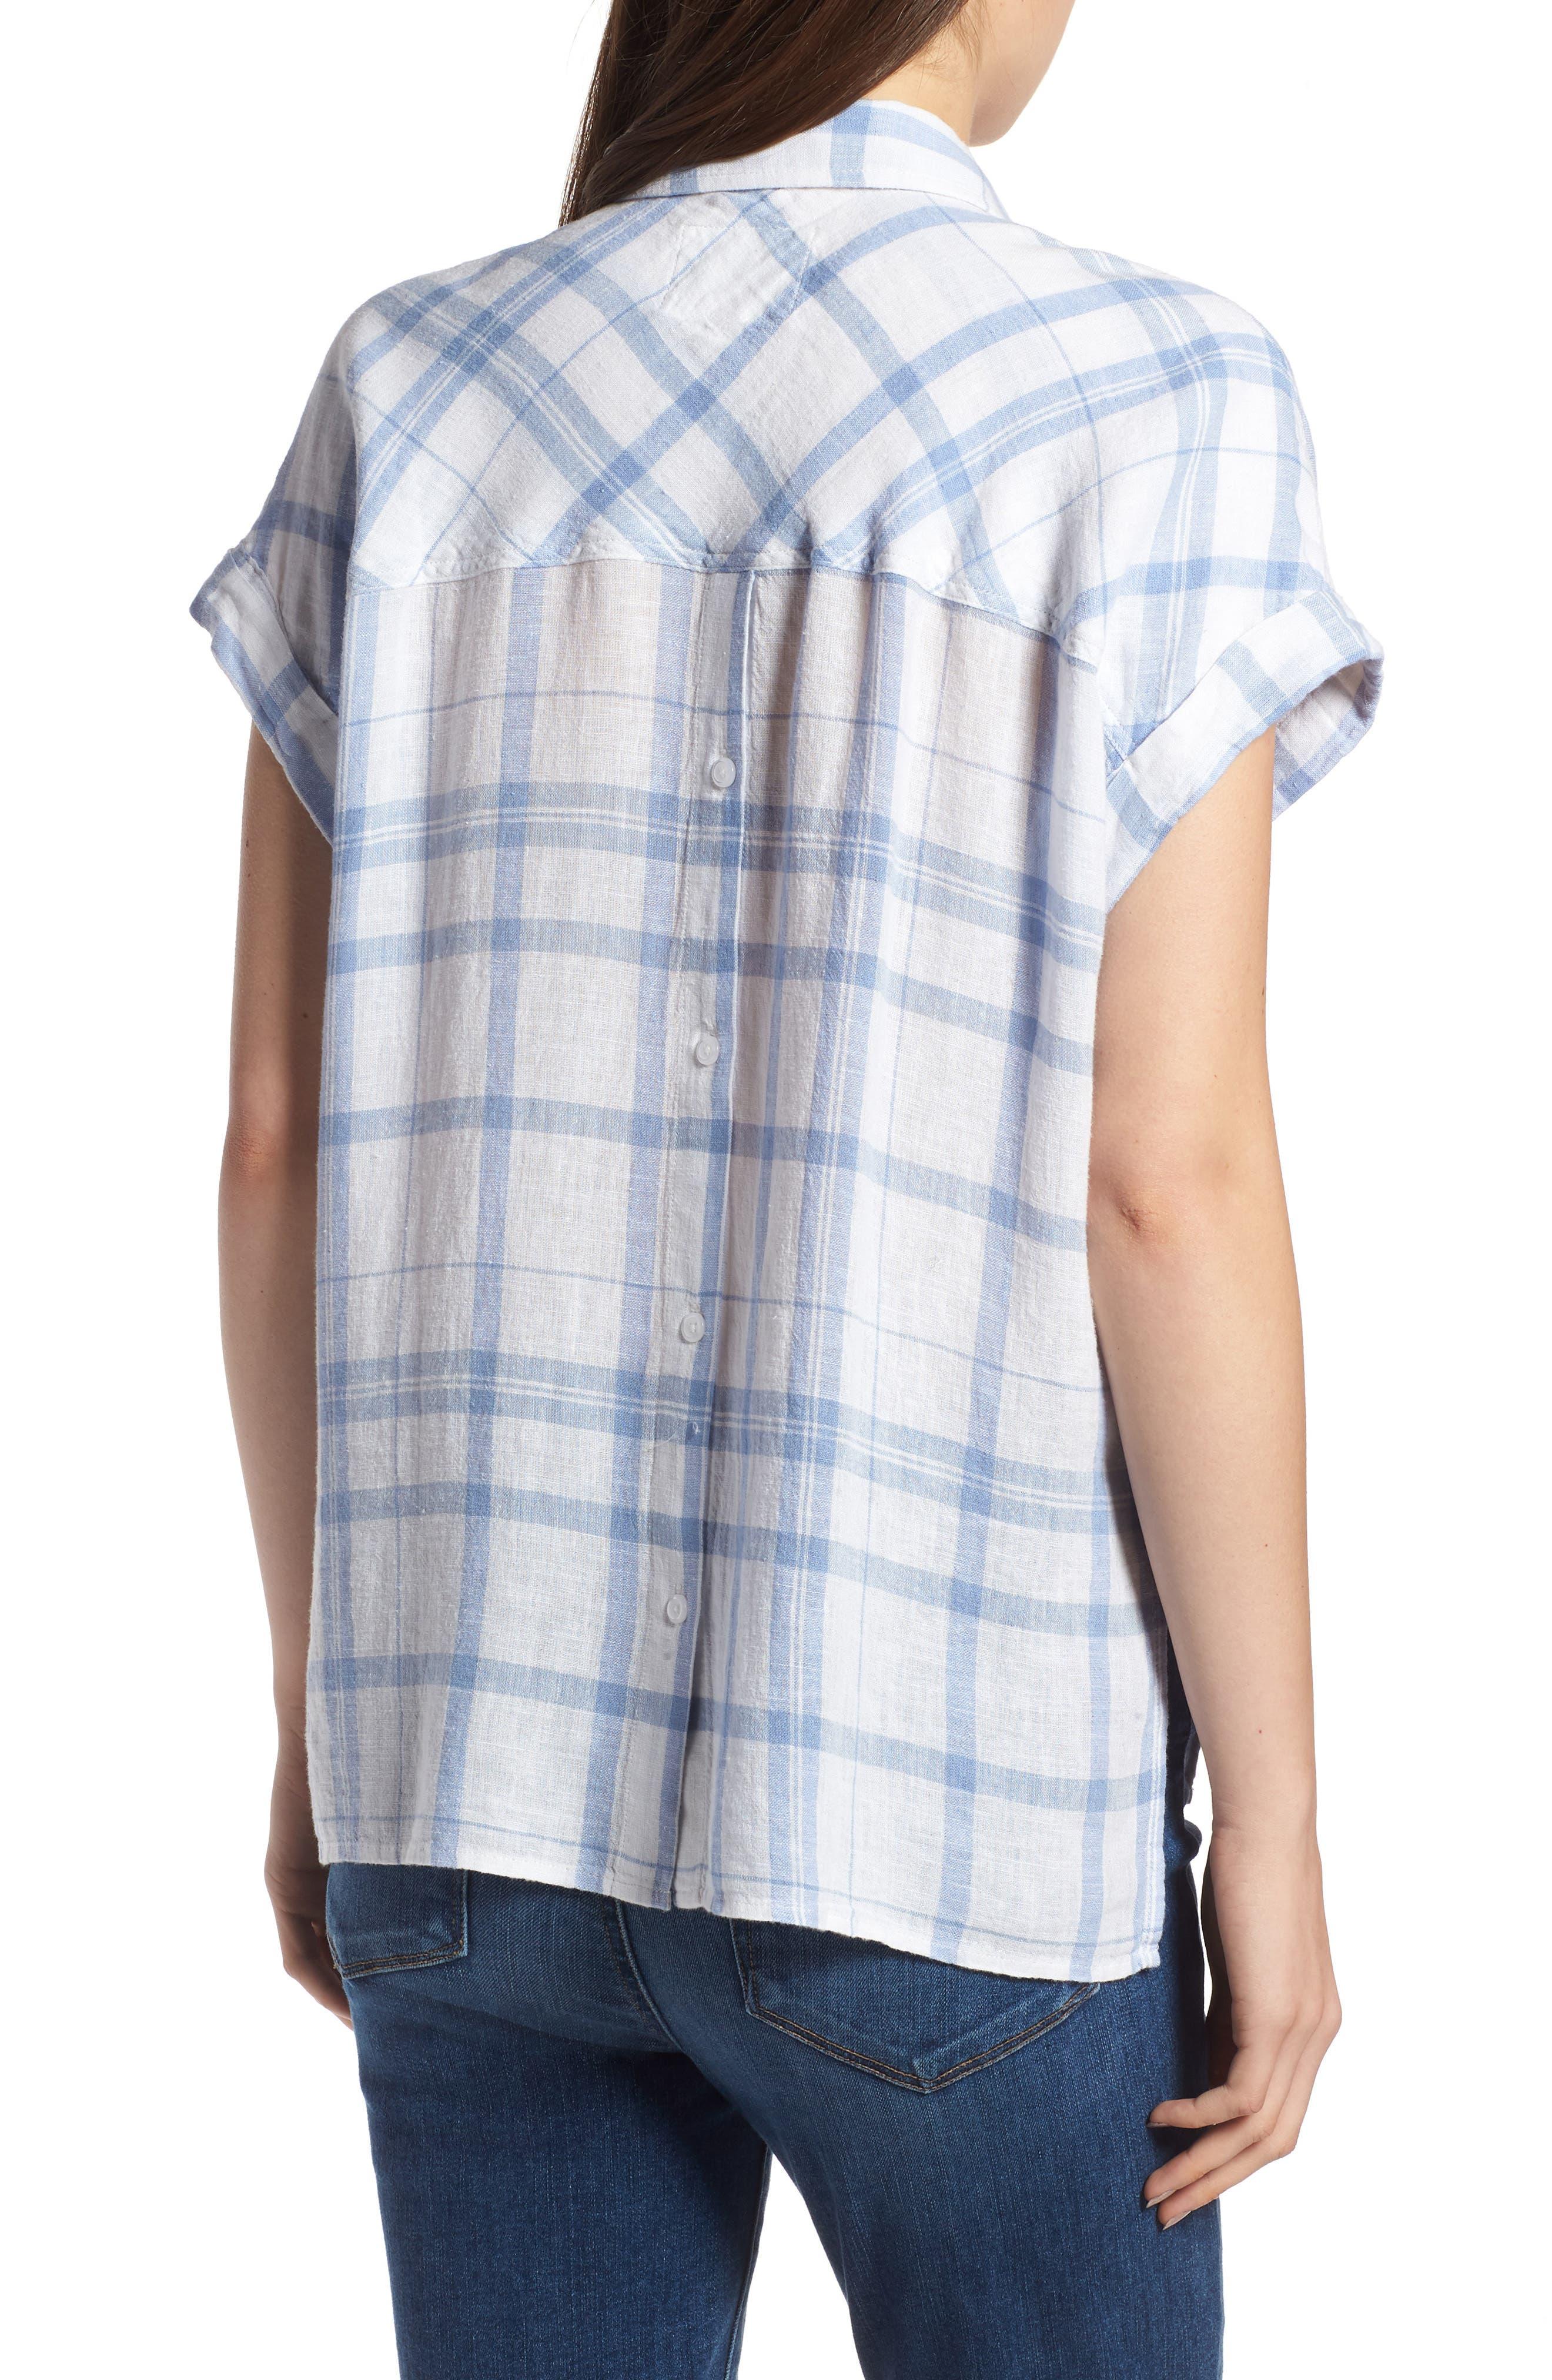 Mia Plaid Shirt,                             Alternate thumbnail 2, color,                             True Blue White